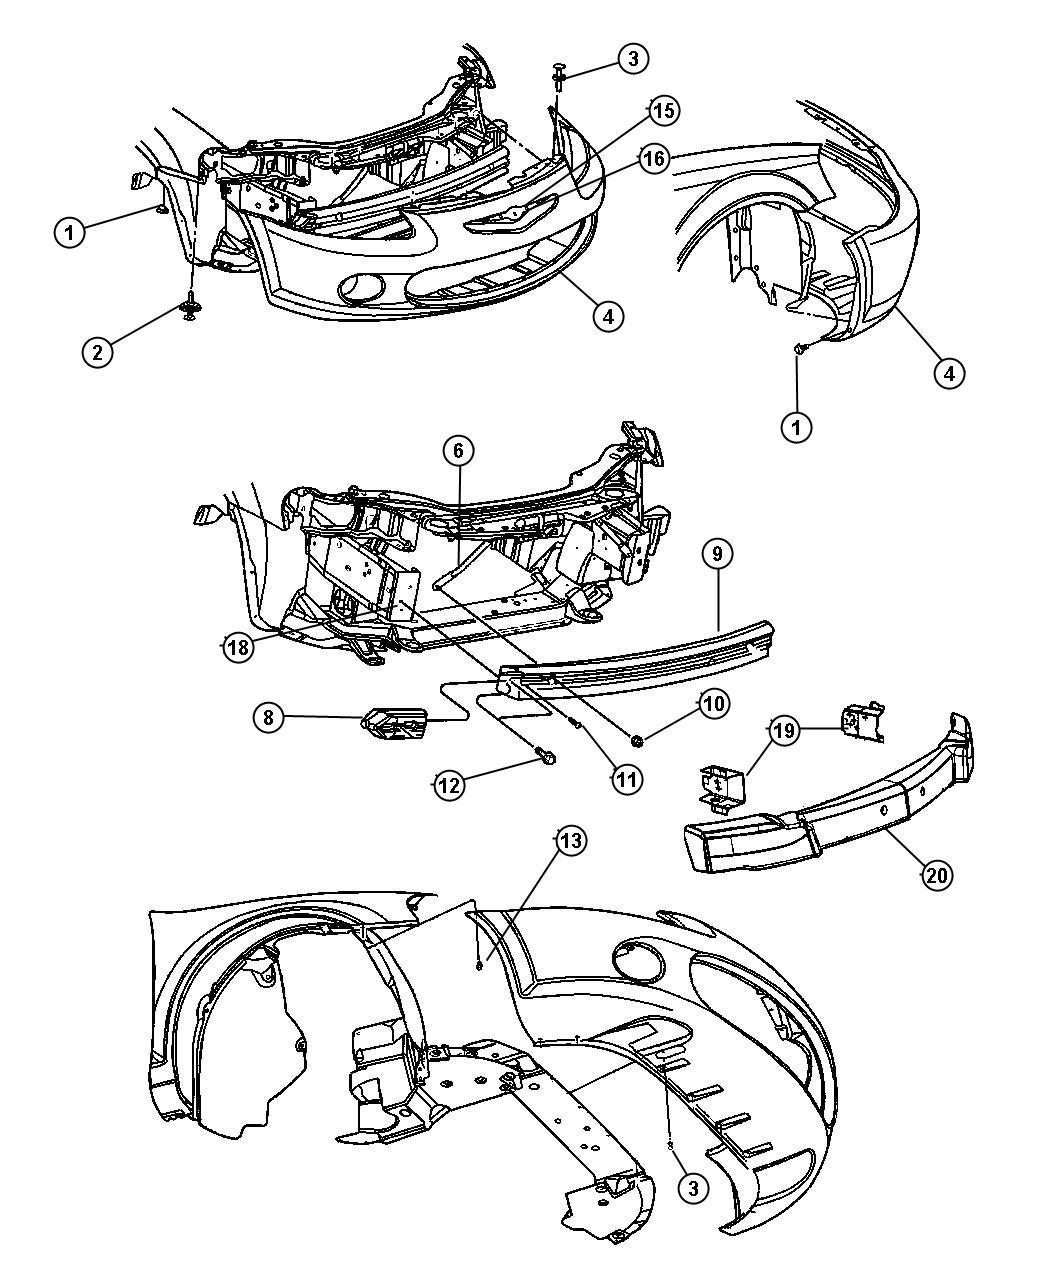 hight resolution of diagrams wiring 86 k20 wiring diagram